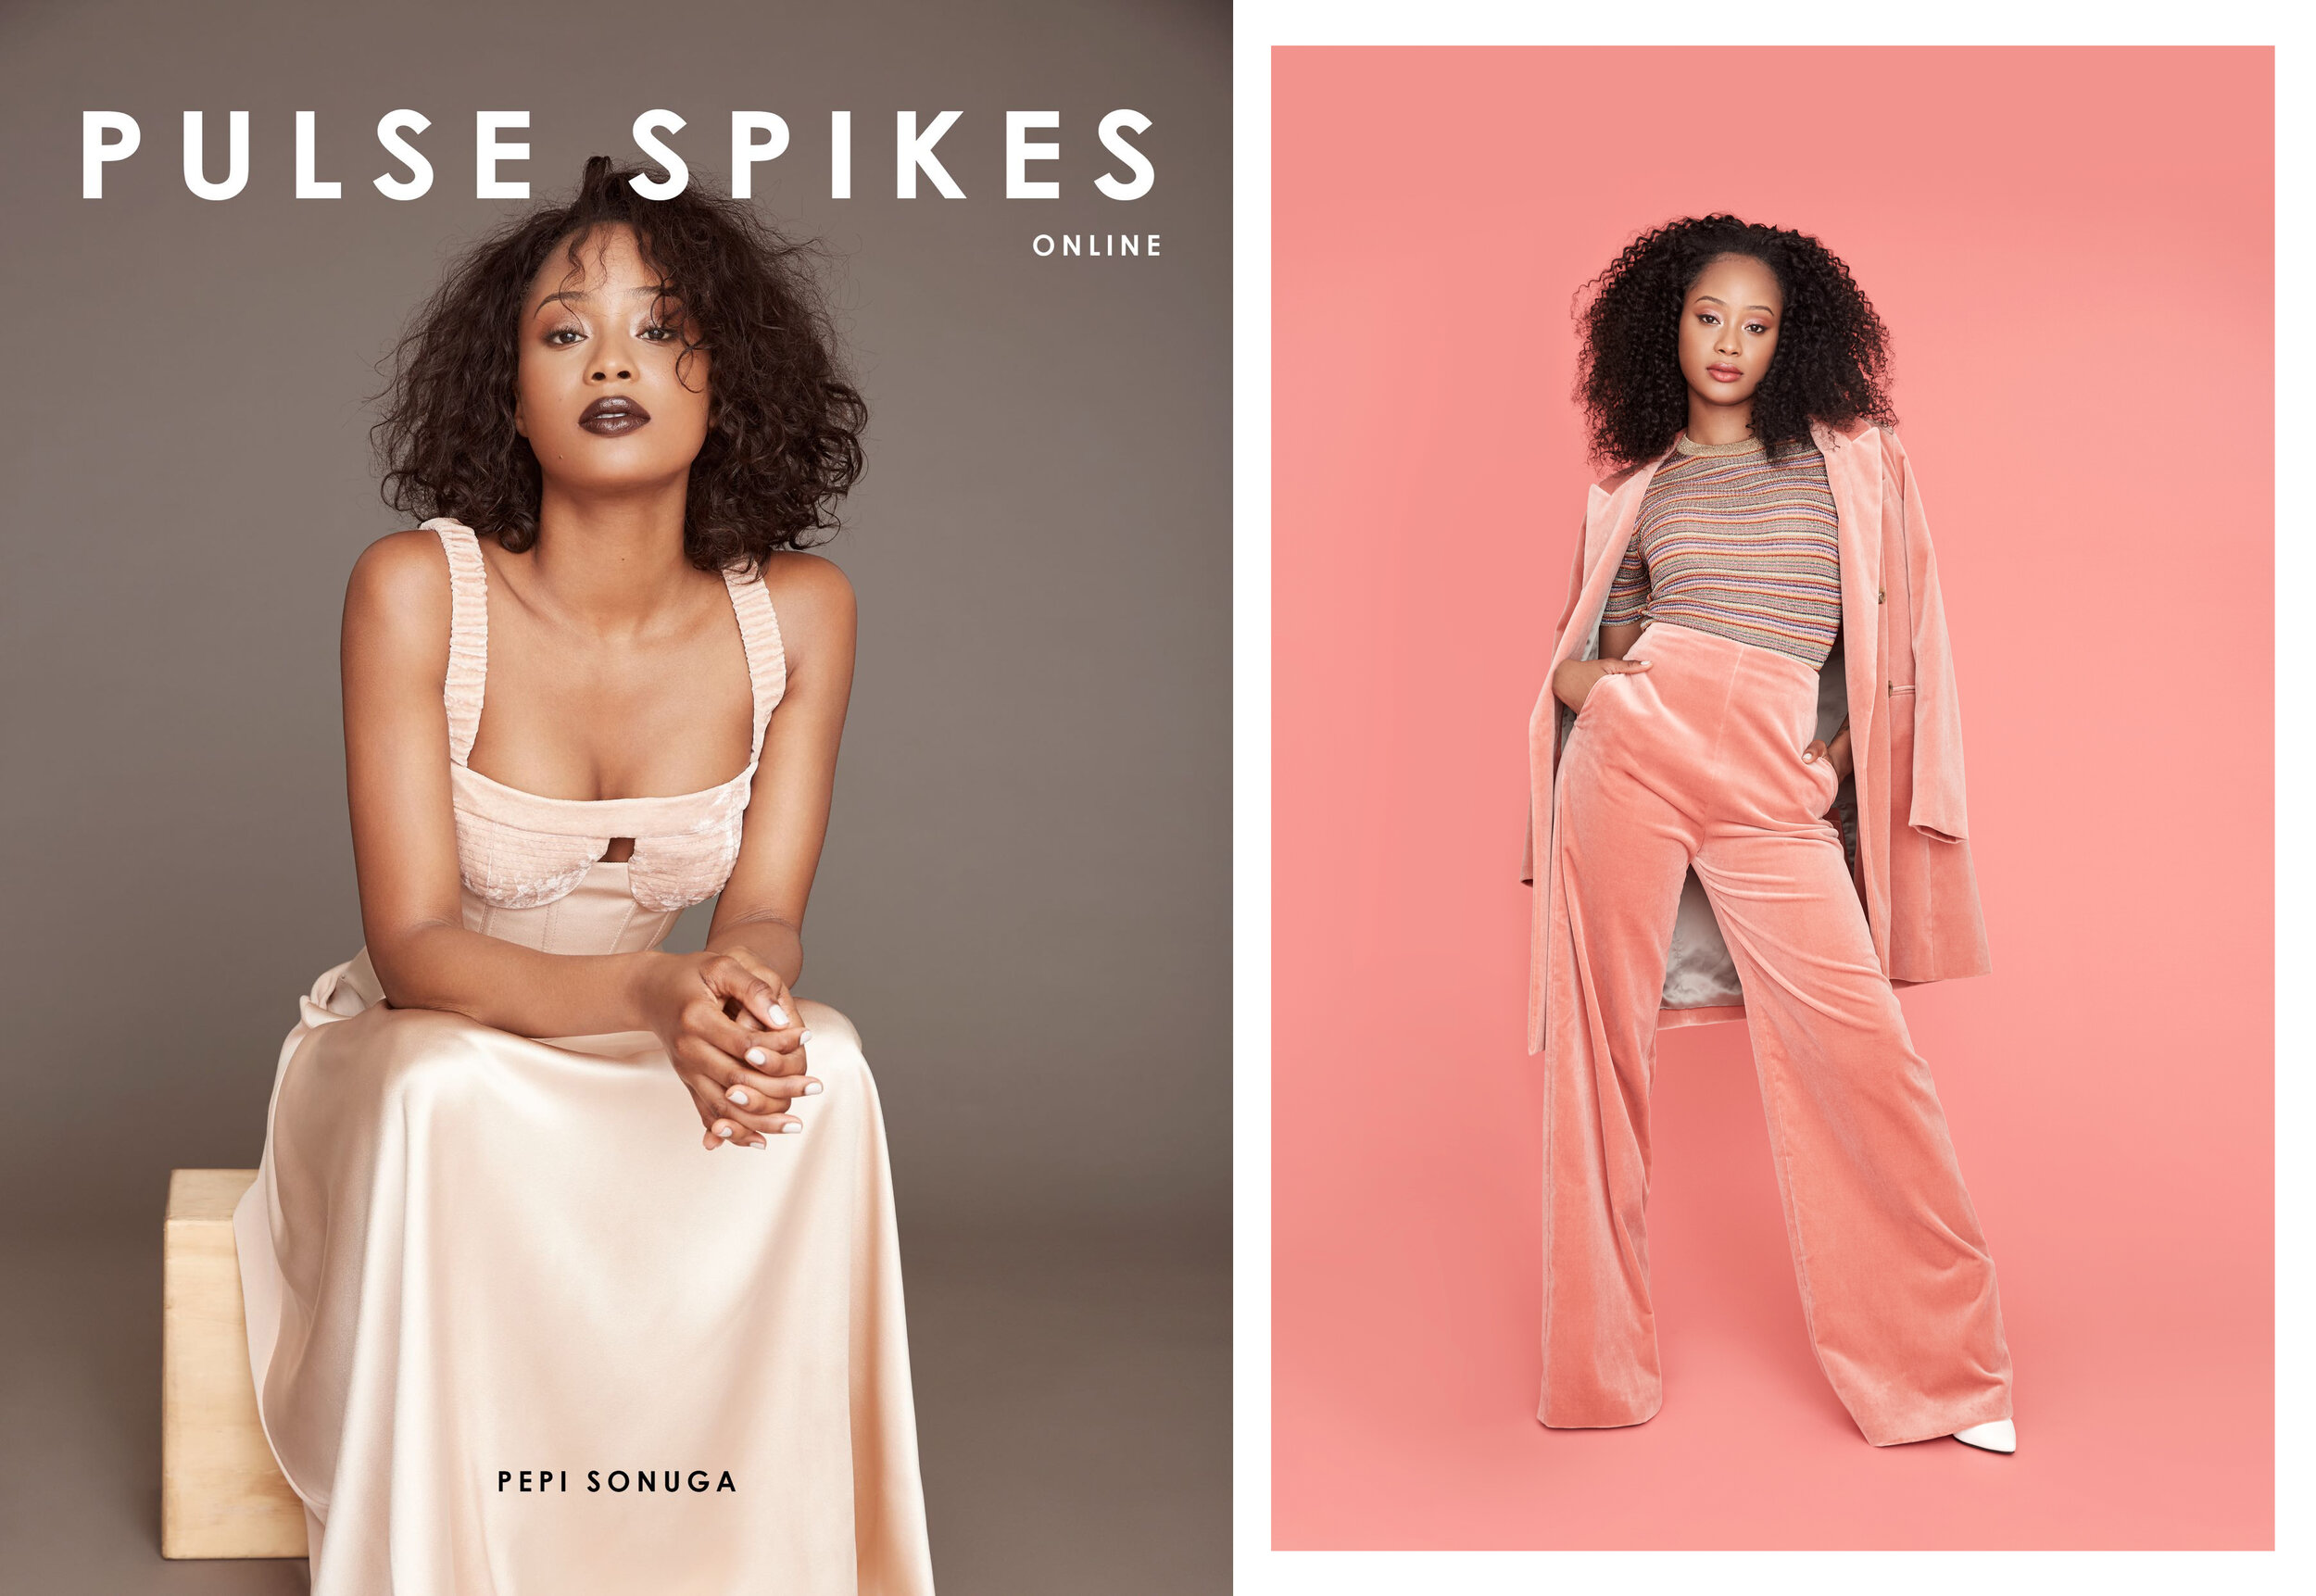 Summer-2018-Online-Cover-8-1 copy.jpg